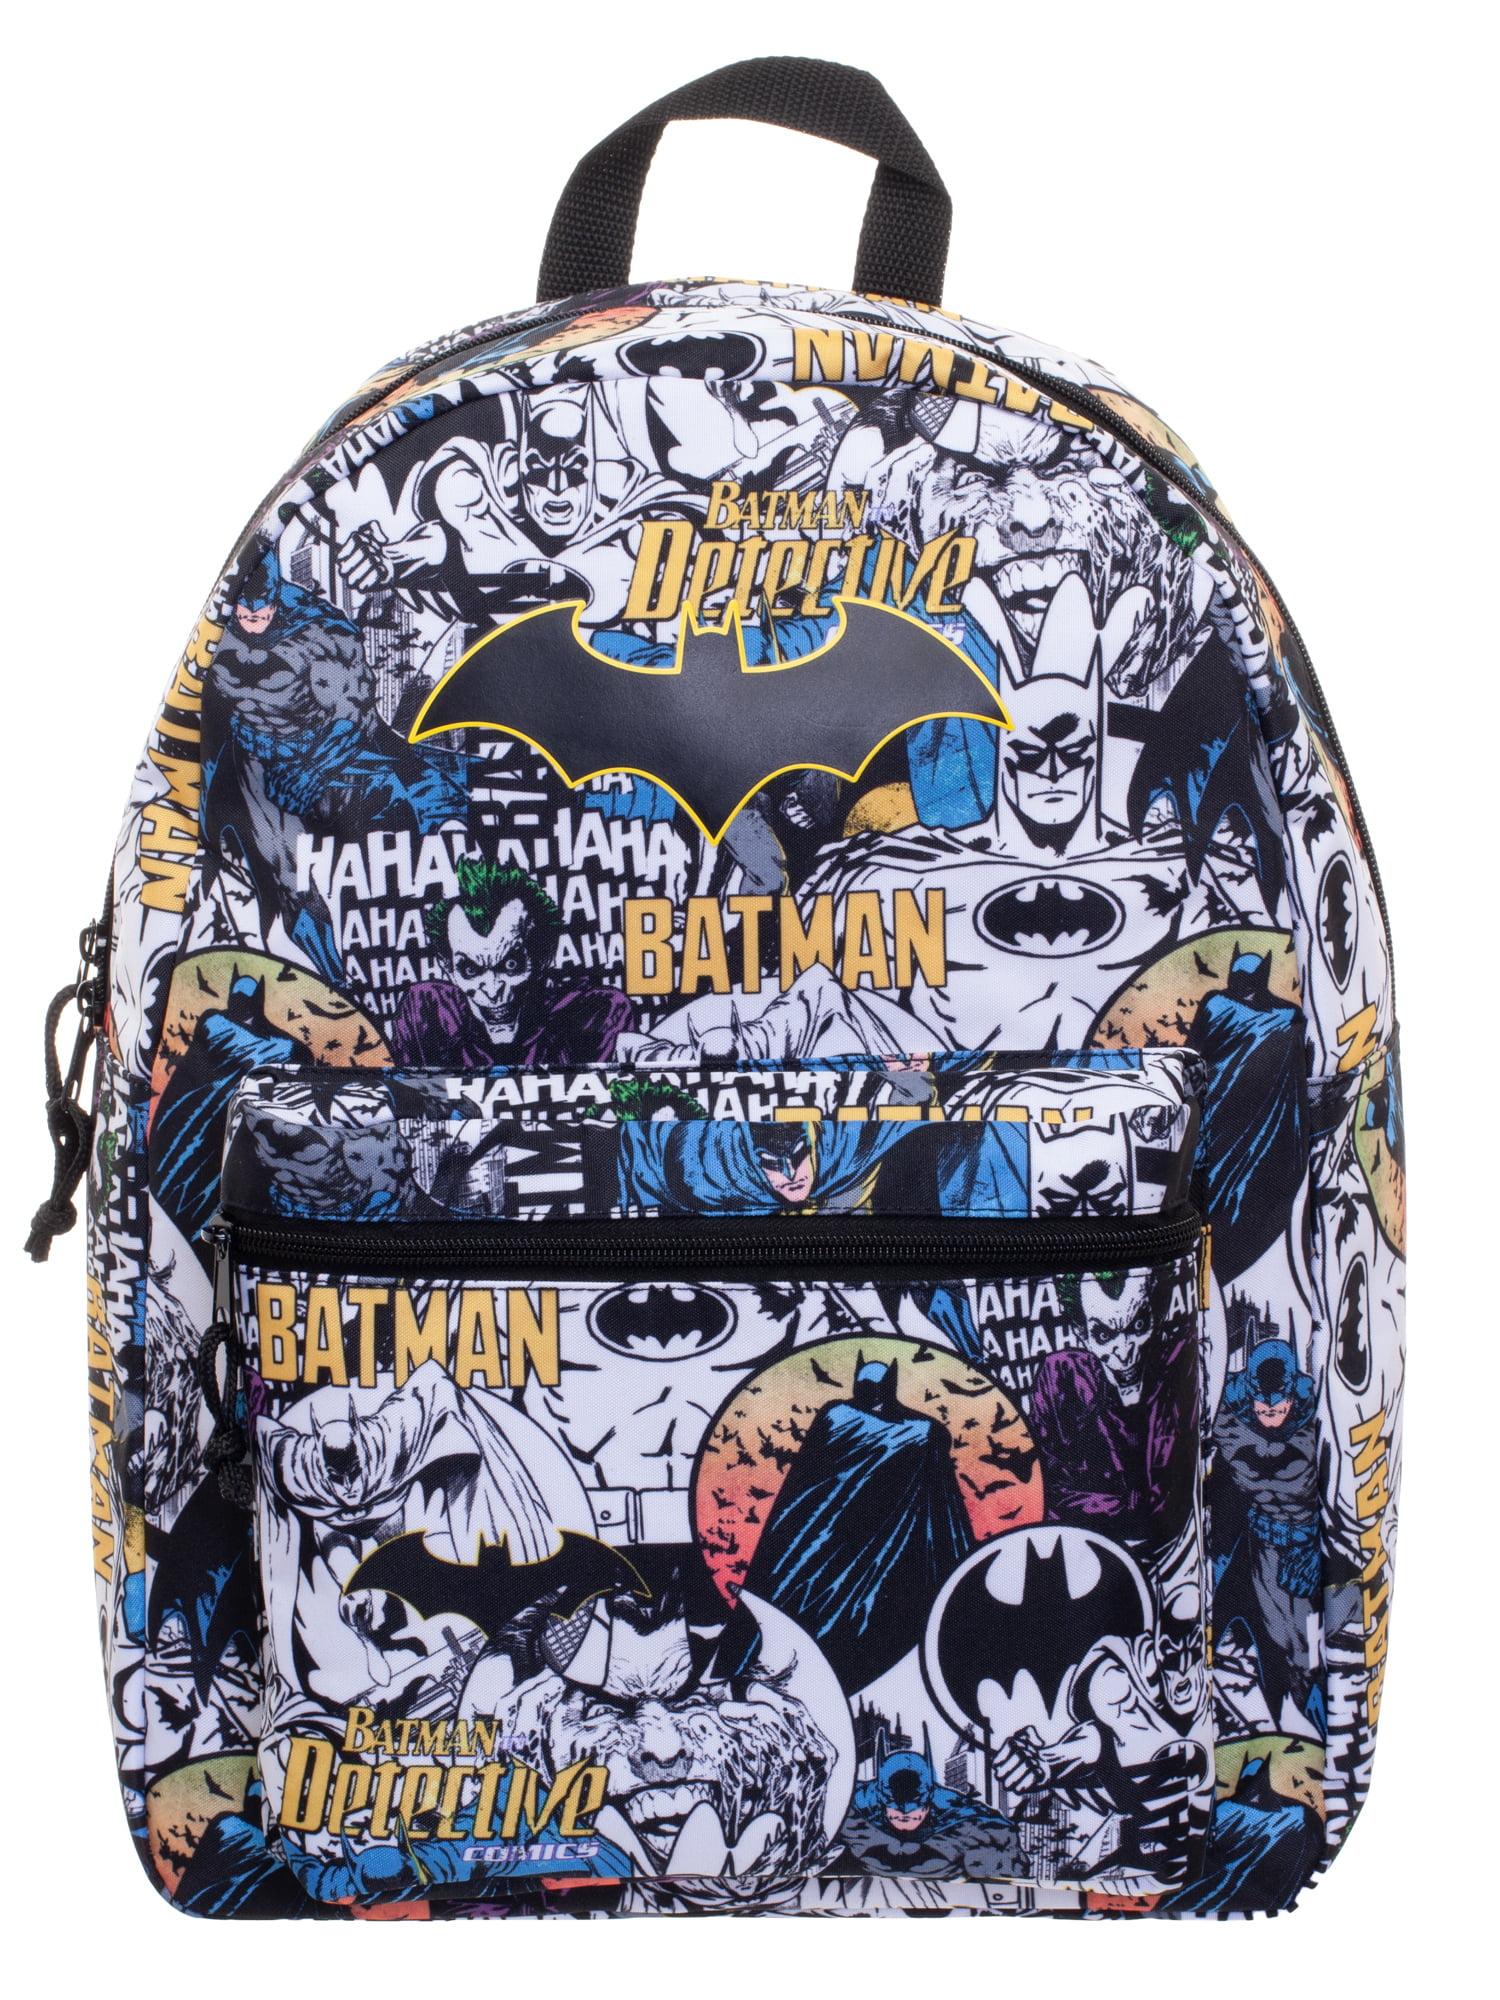 "DC Comics Batman Classic Comic Characters 16"" Backpack by Bioworld Merchandising"